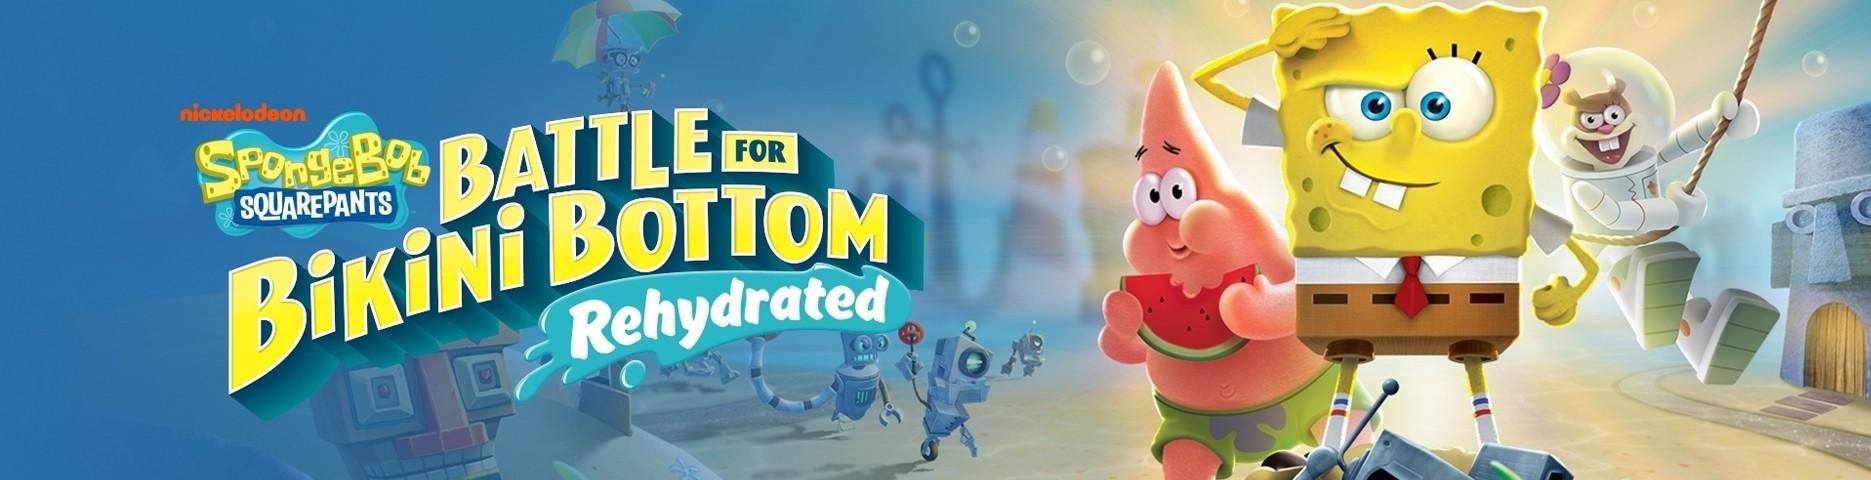 Spongebob Battle for Bikini Botom Rehydrated